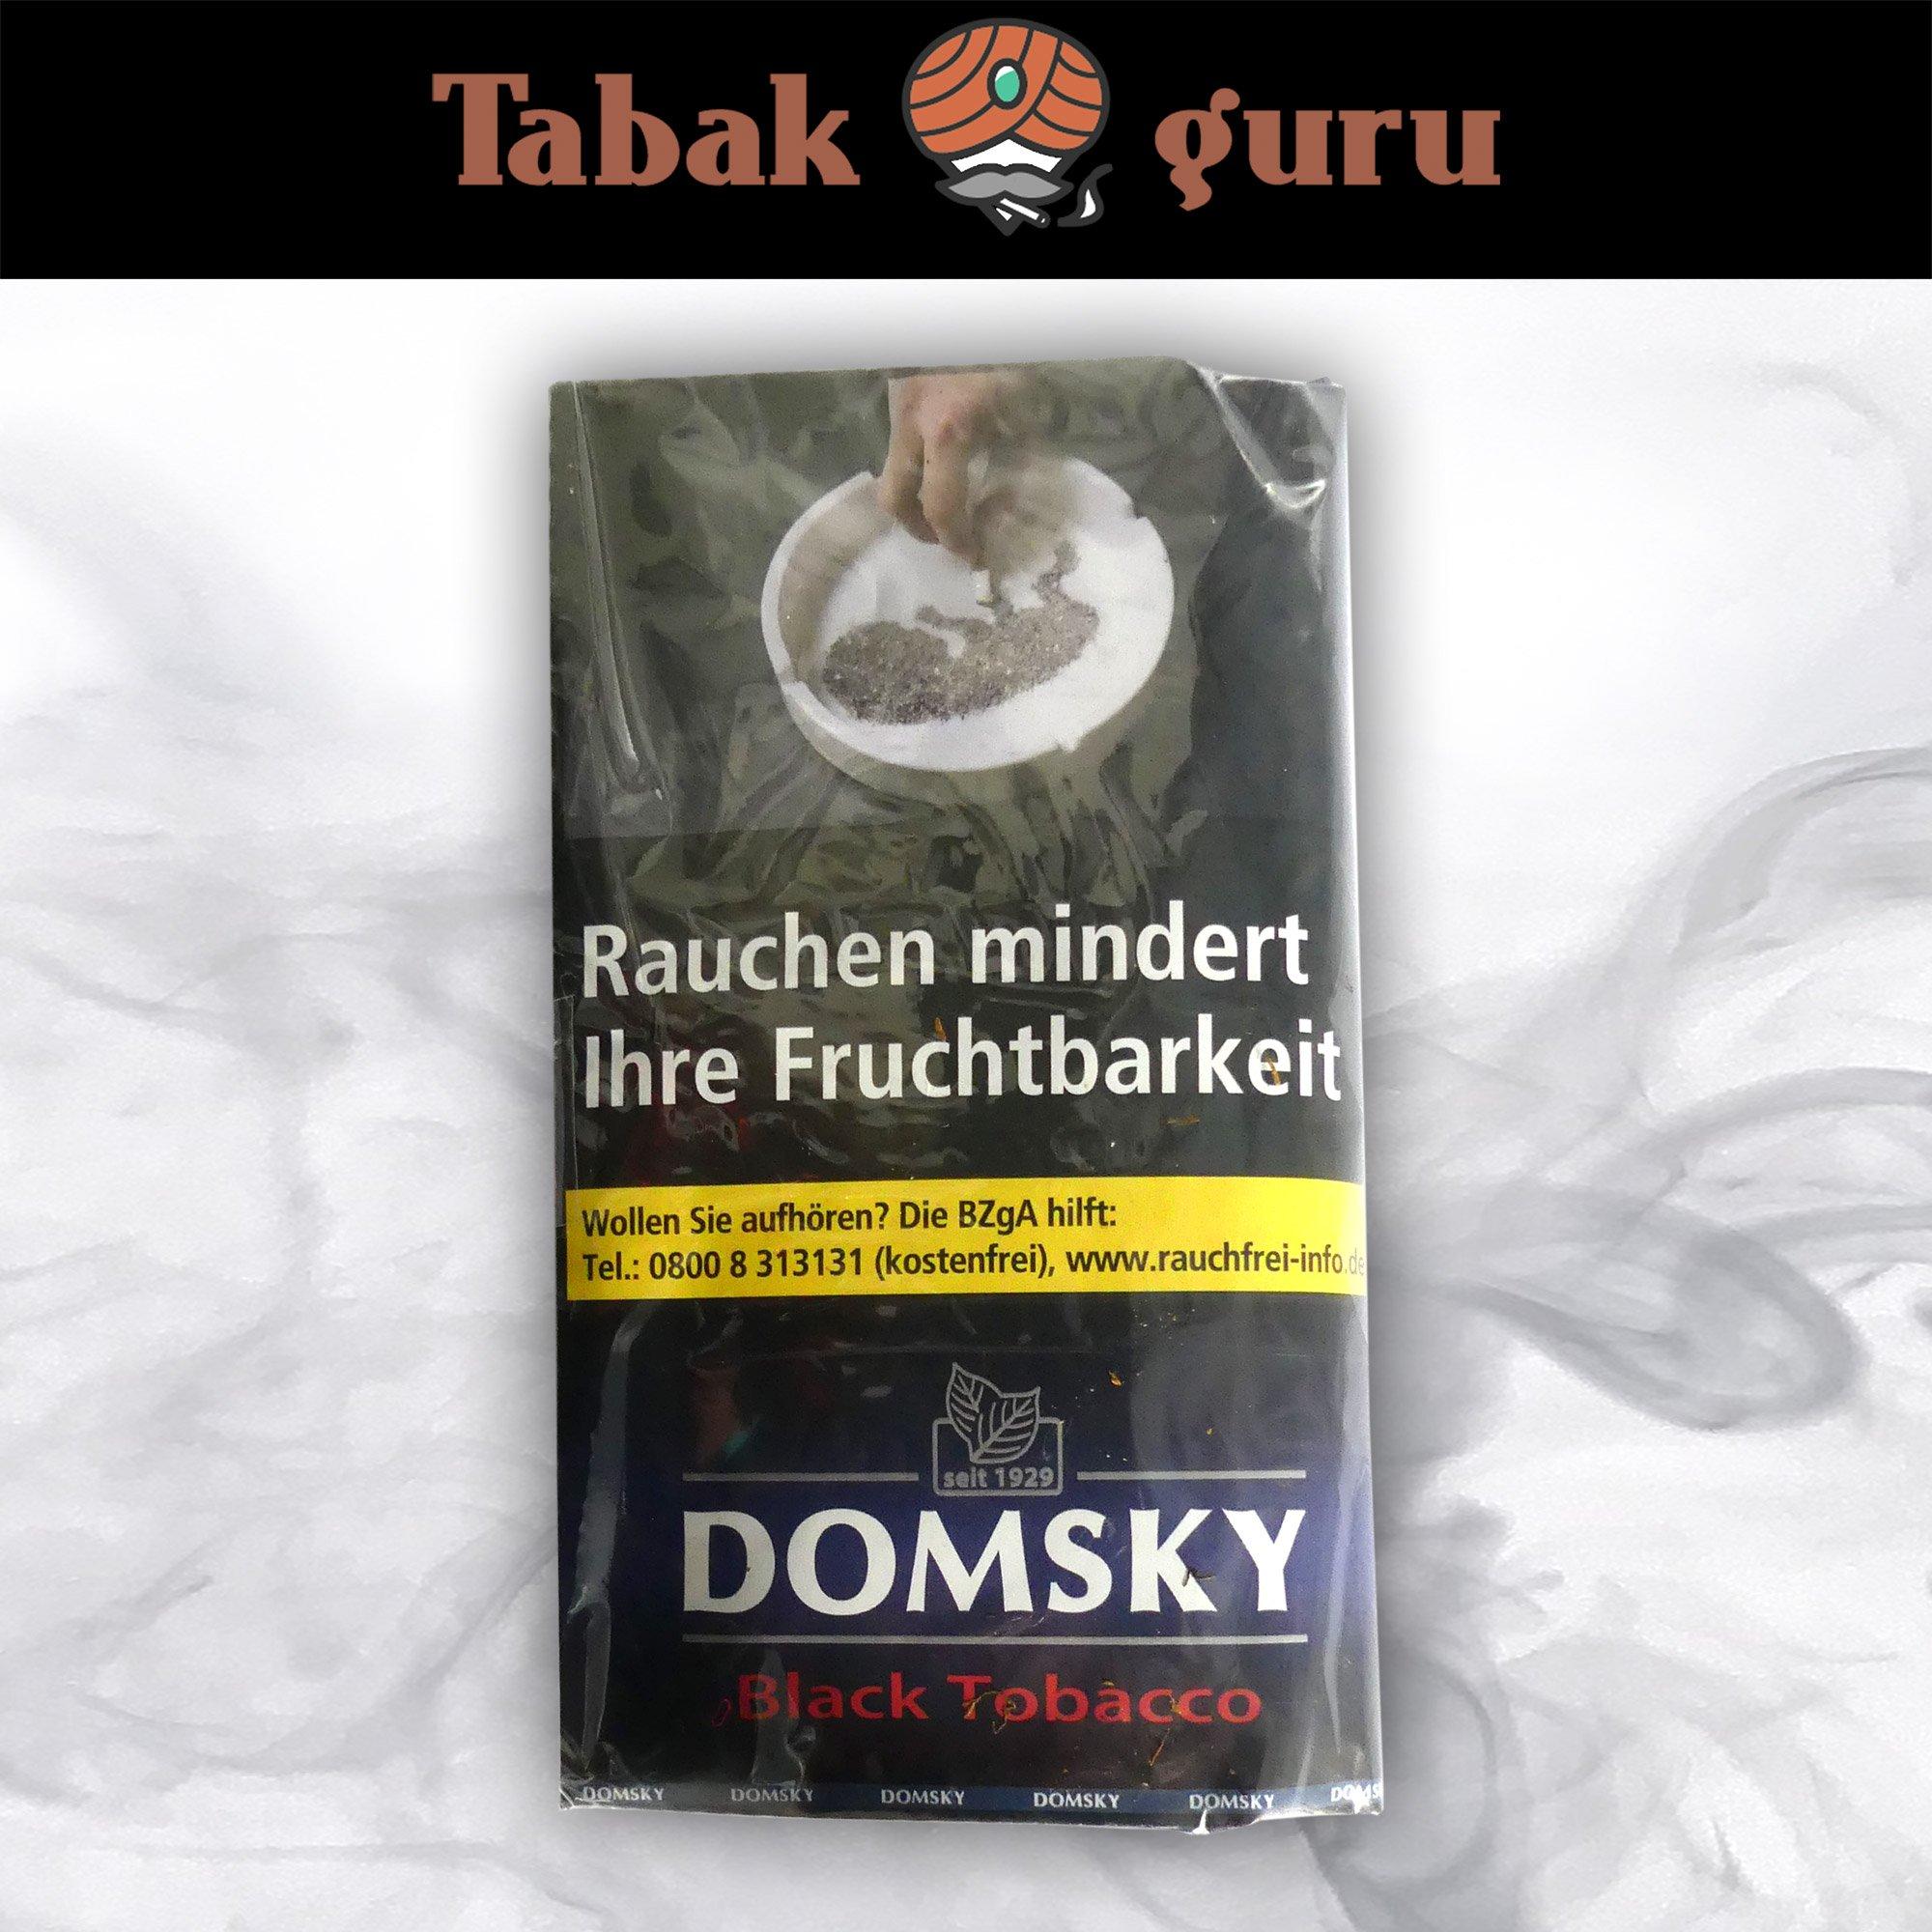 DOMSKY Black Tobacco Drehtabak 40 g